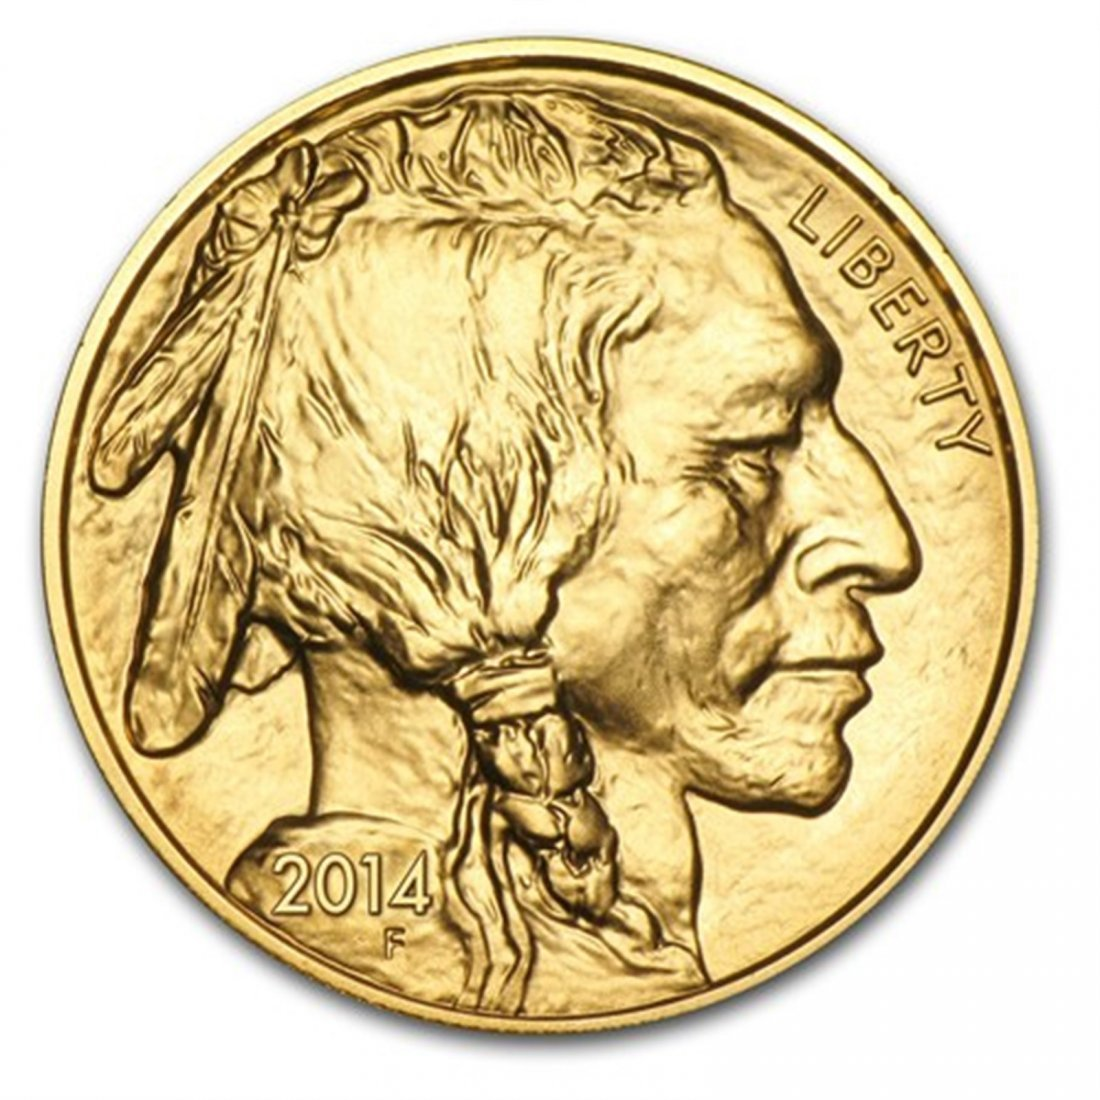 2014 1 oz Gold Buffalo BU